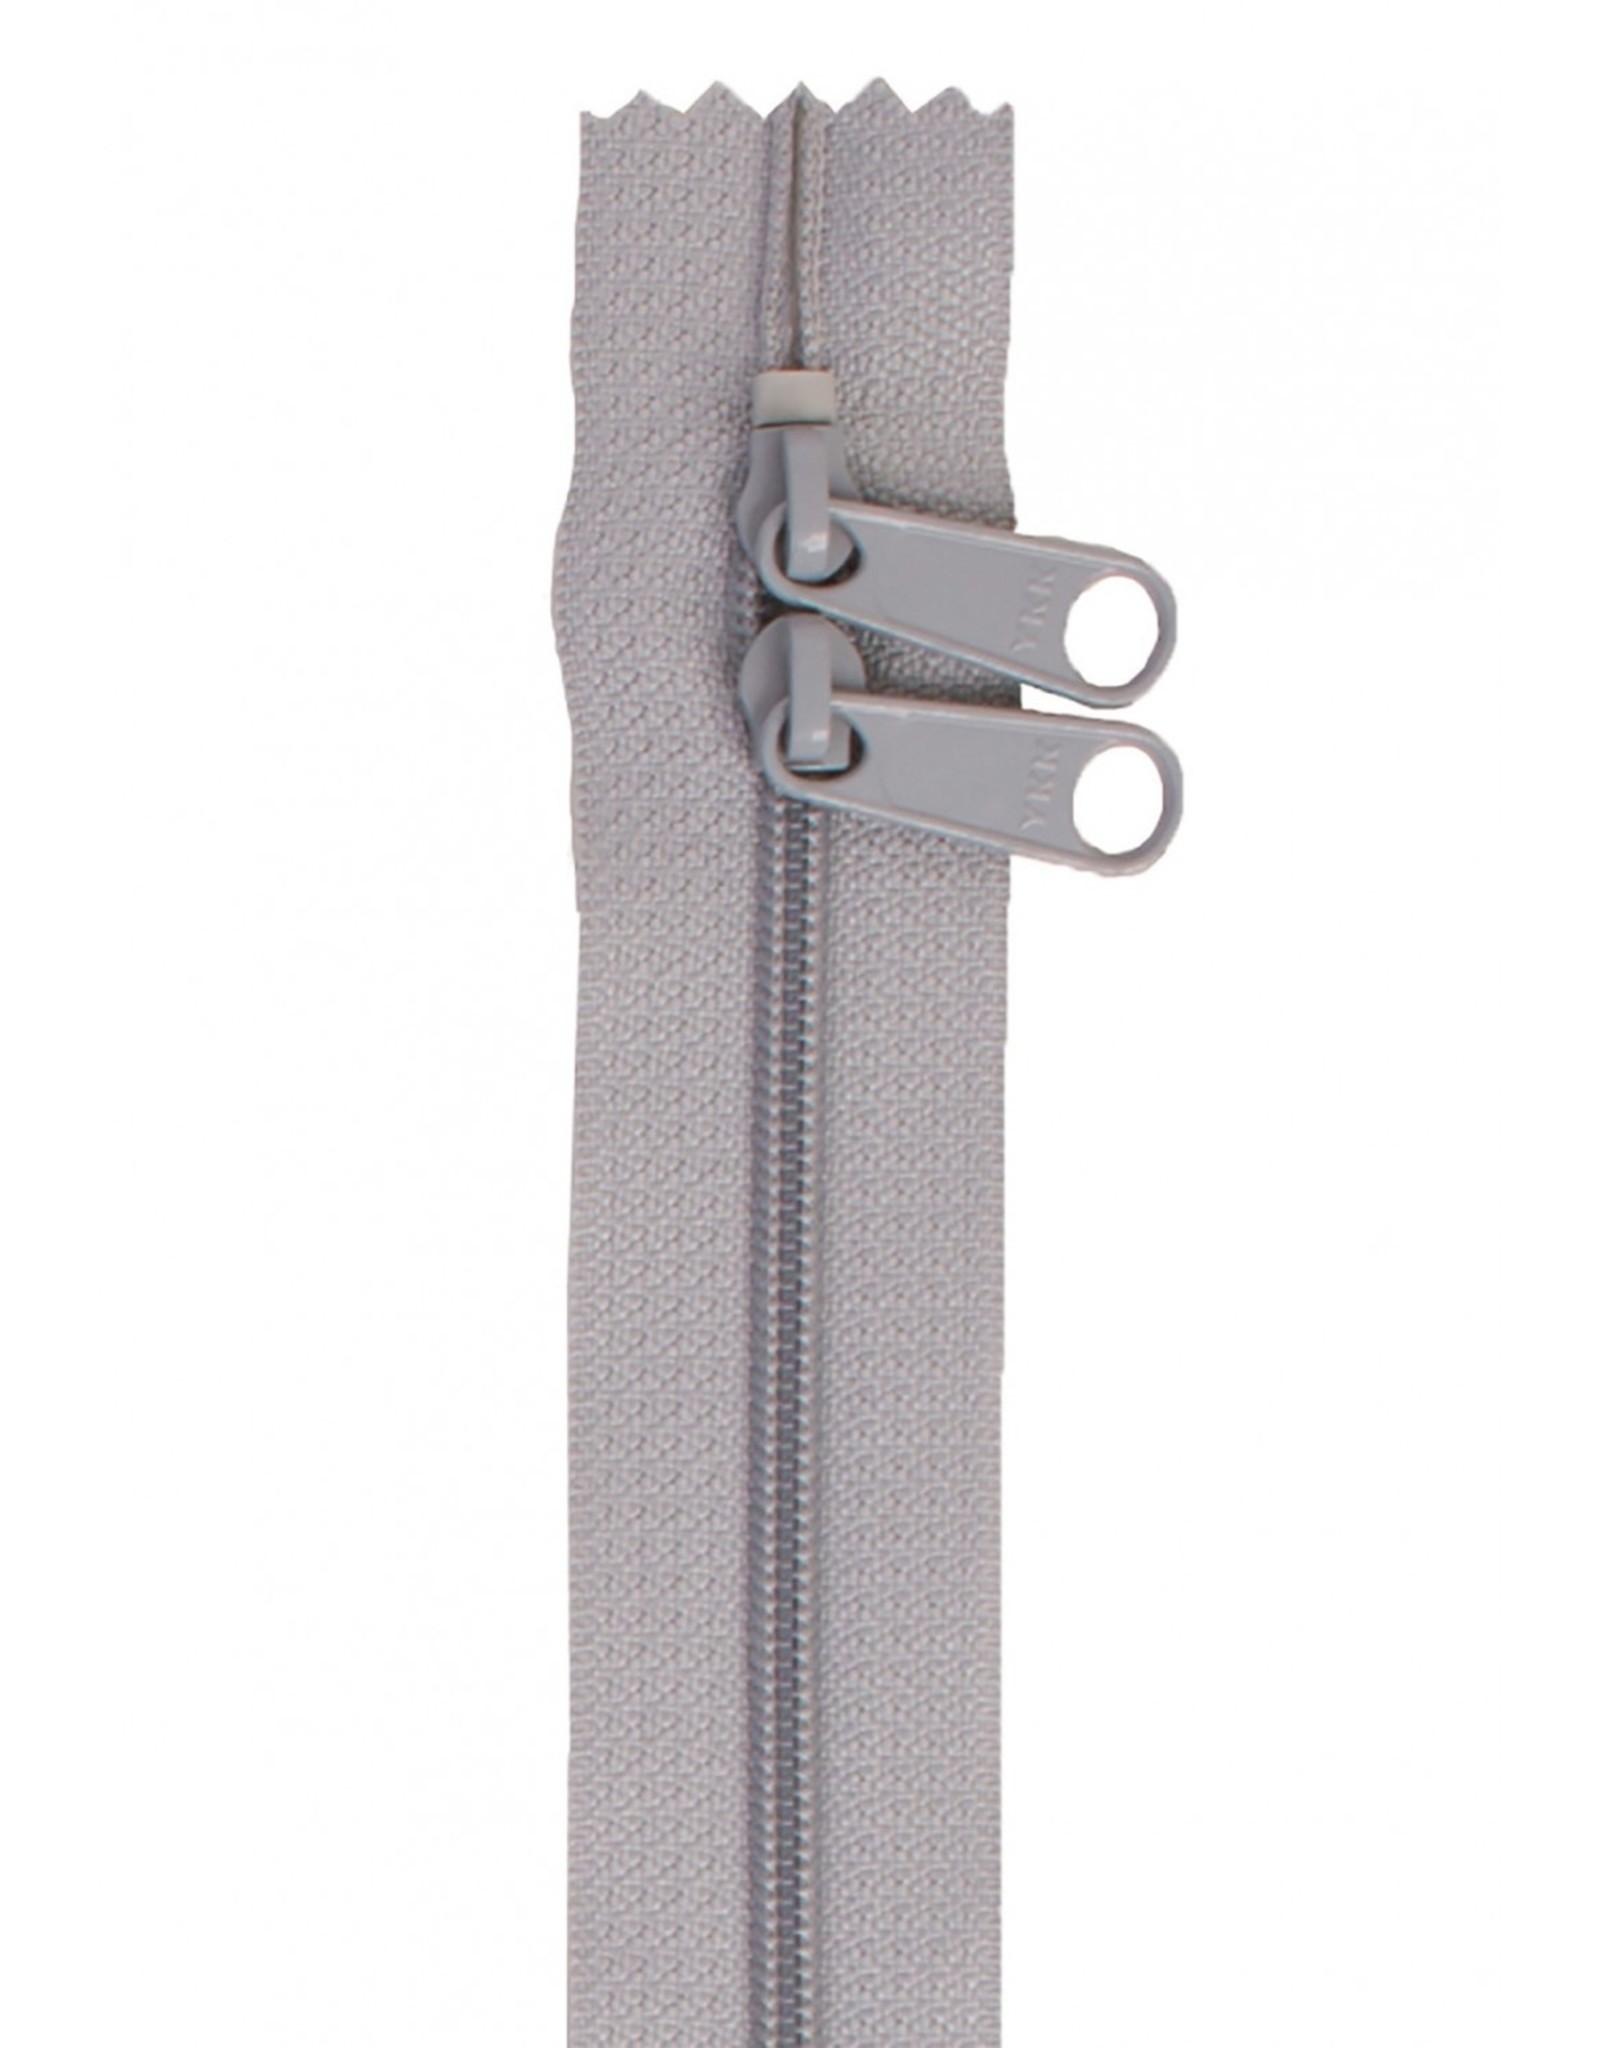 By Annie Handbag Zipper - 30 inch / 76 cm - double slide - Pewter